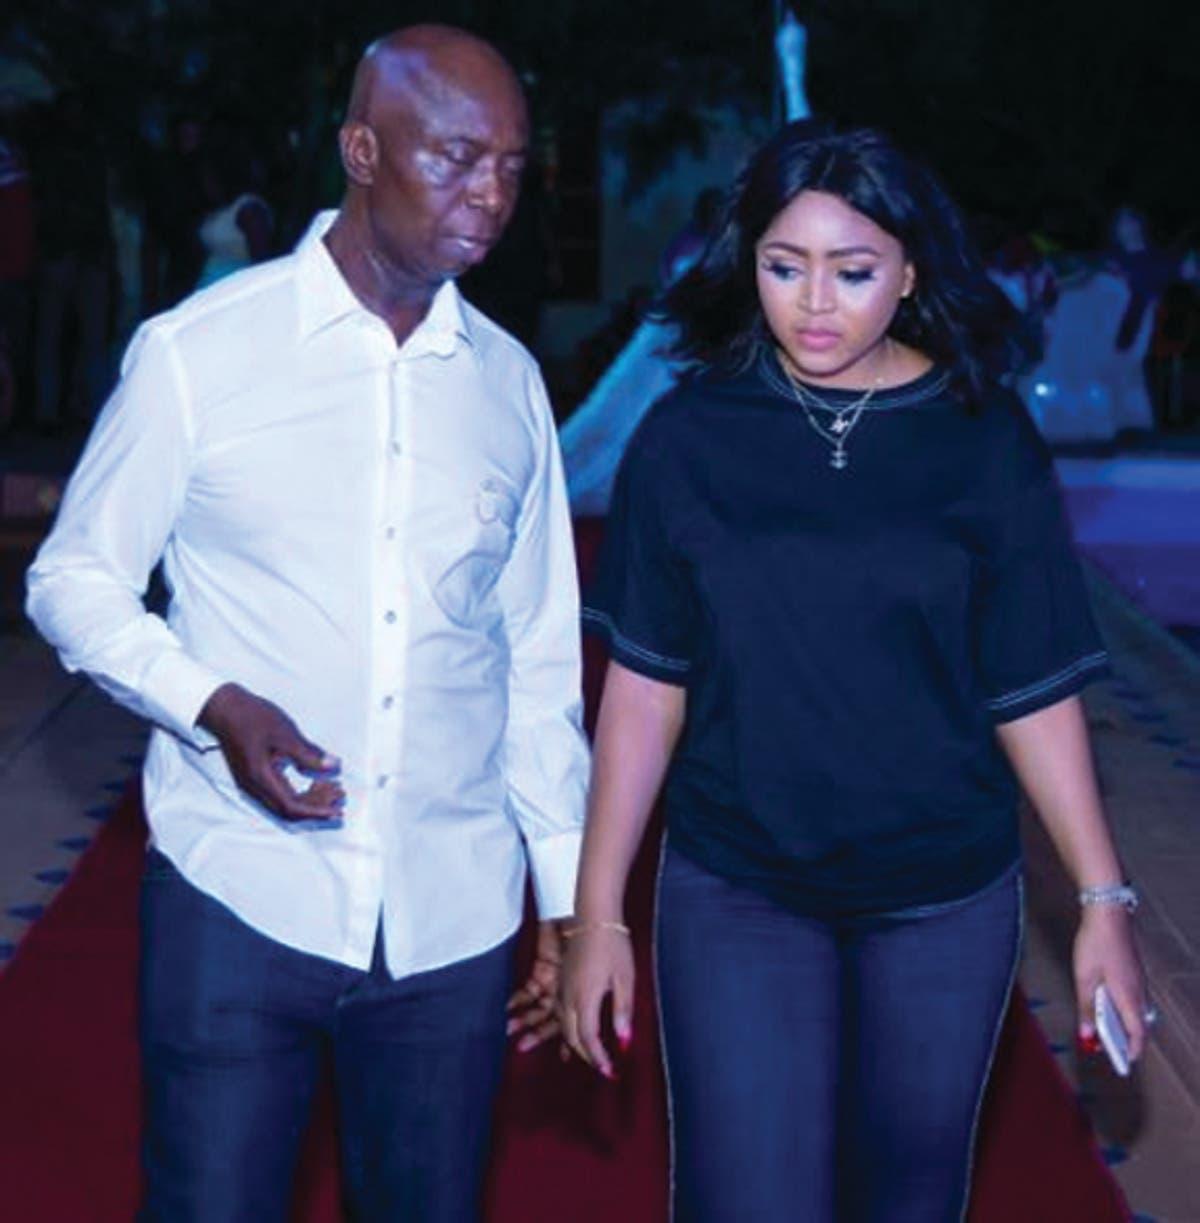 Ned Nwoko Reveals He Married Regina Daniels Within 3 Weeks of Meeting Her